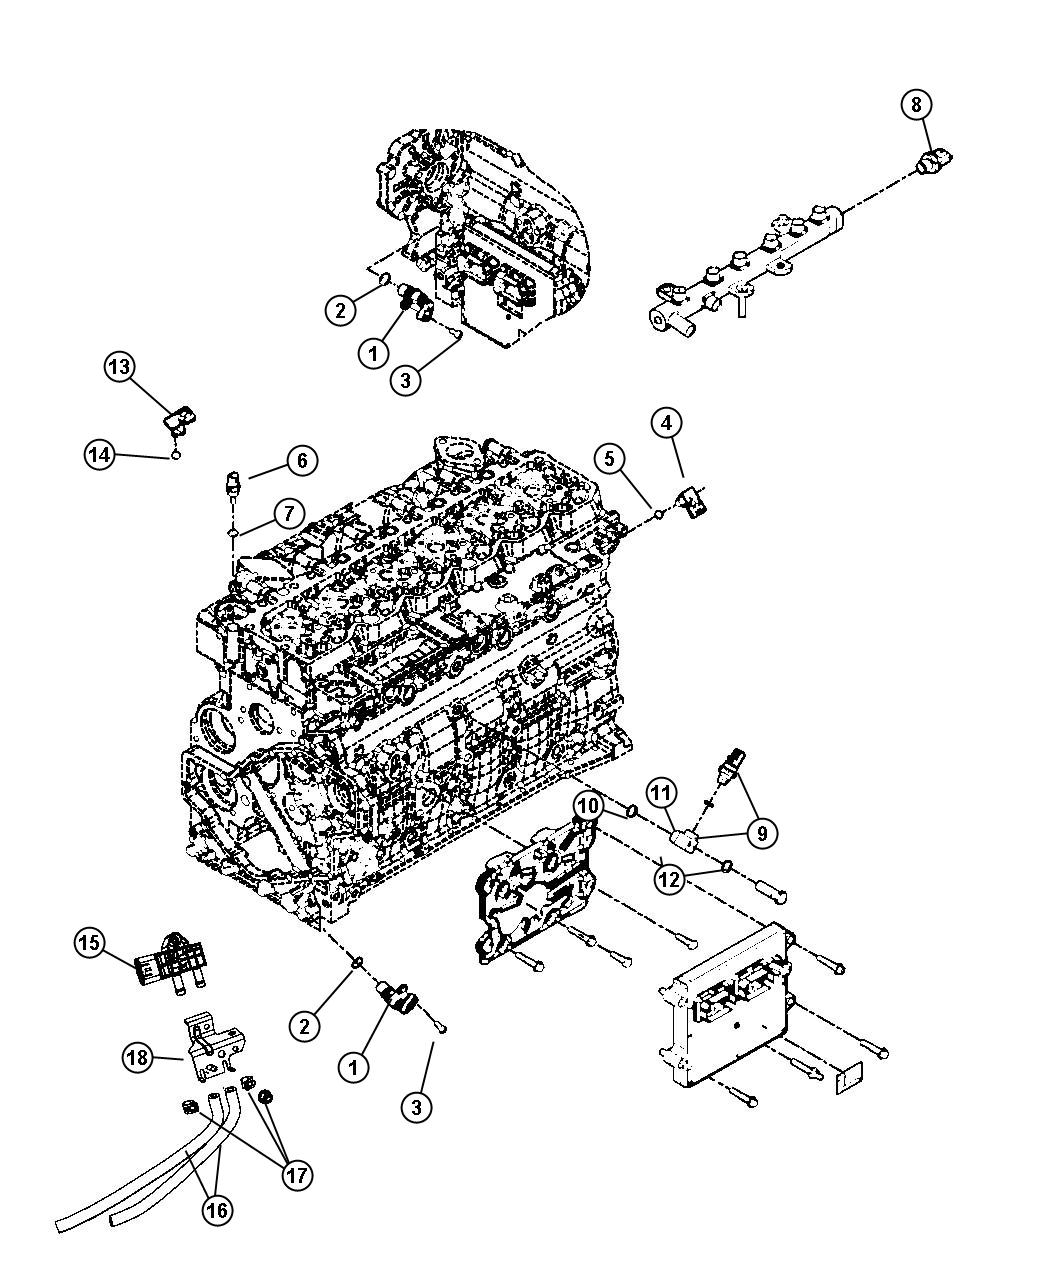 Dodge Ram 4500 Hose. Differential pressure. Down stream